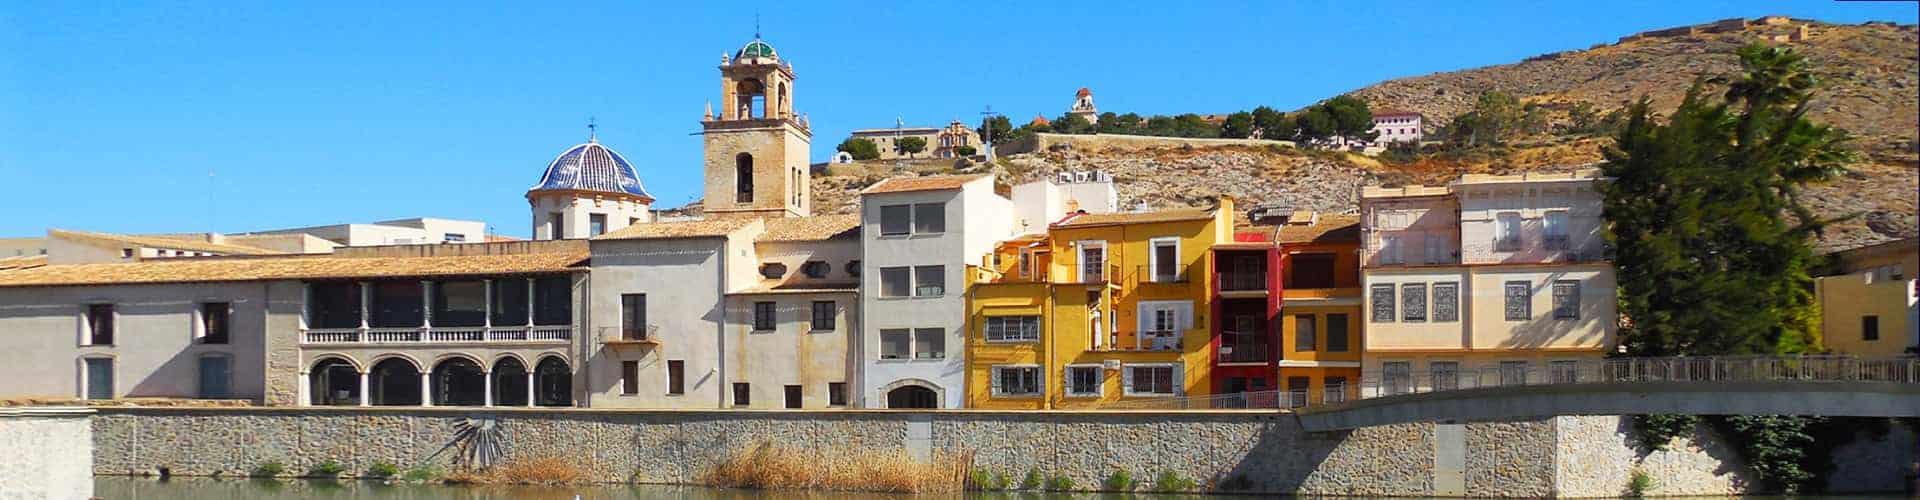 Free Tour Orihuela -Turismo en Alicante